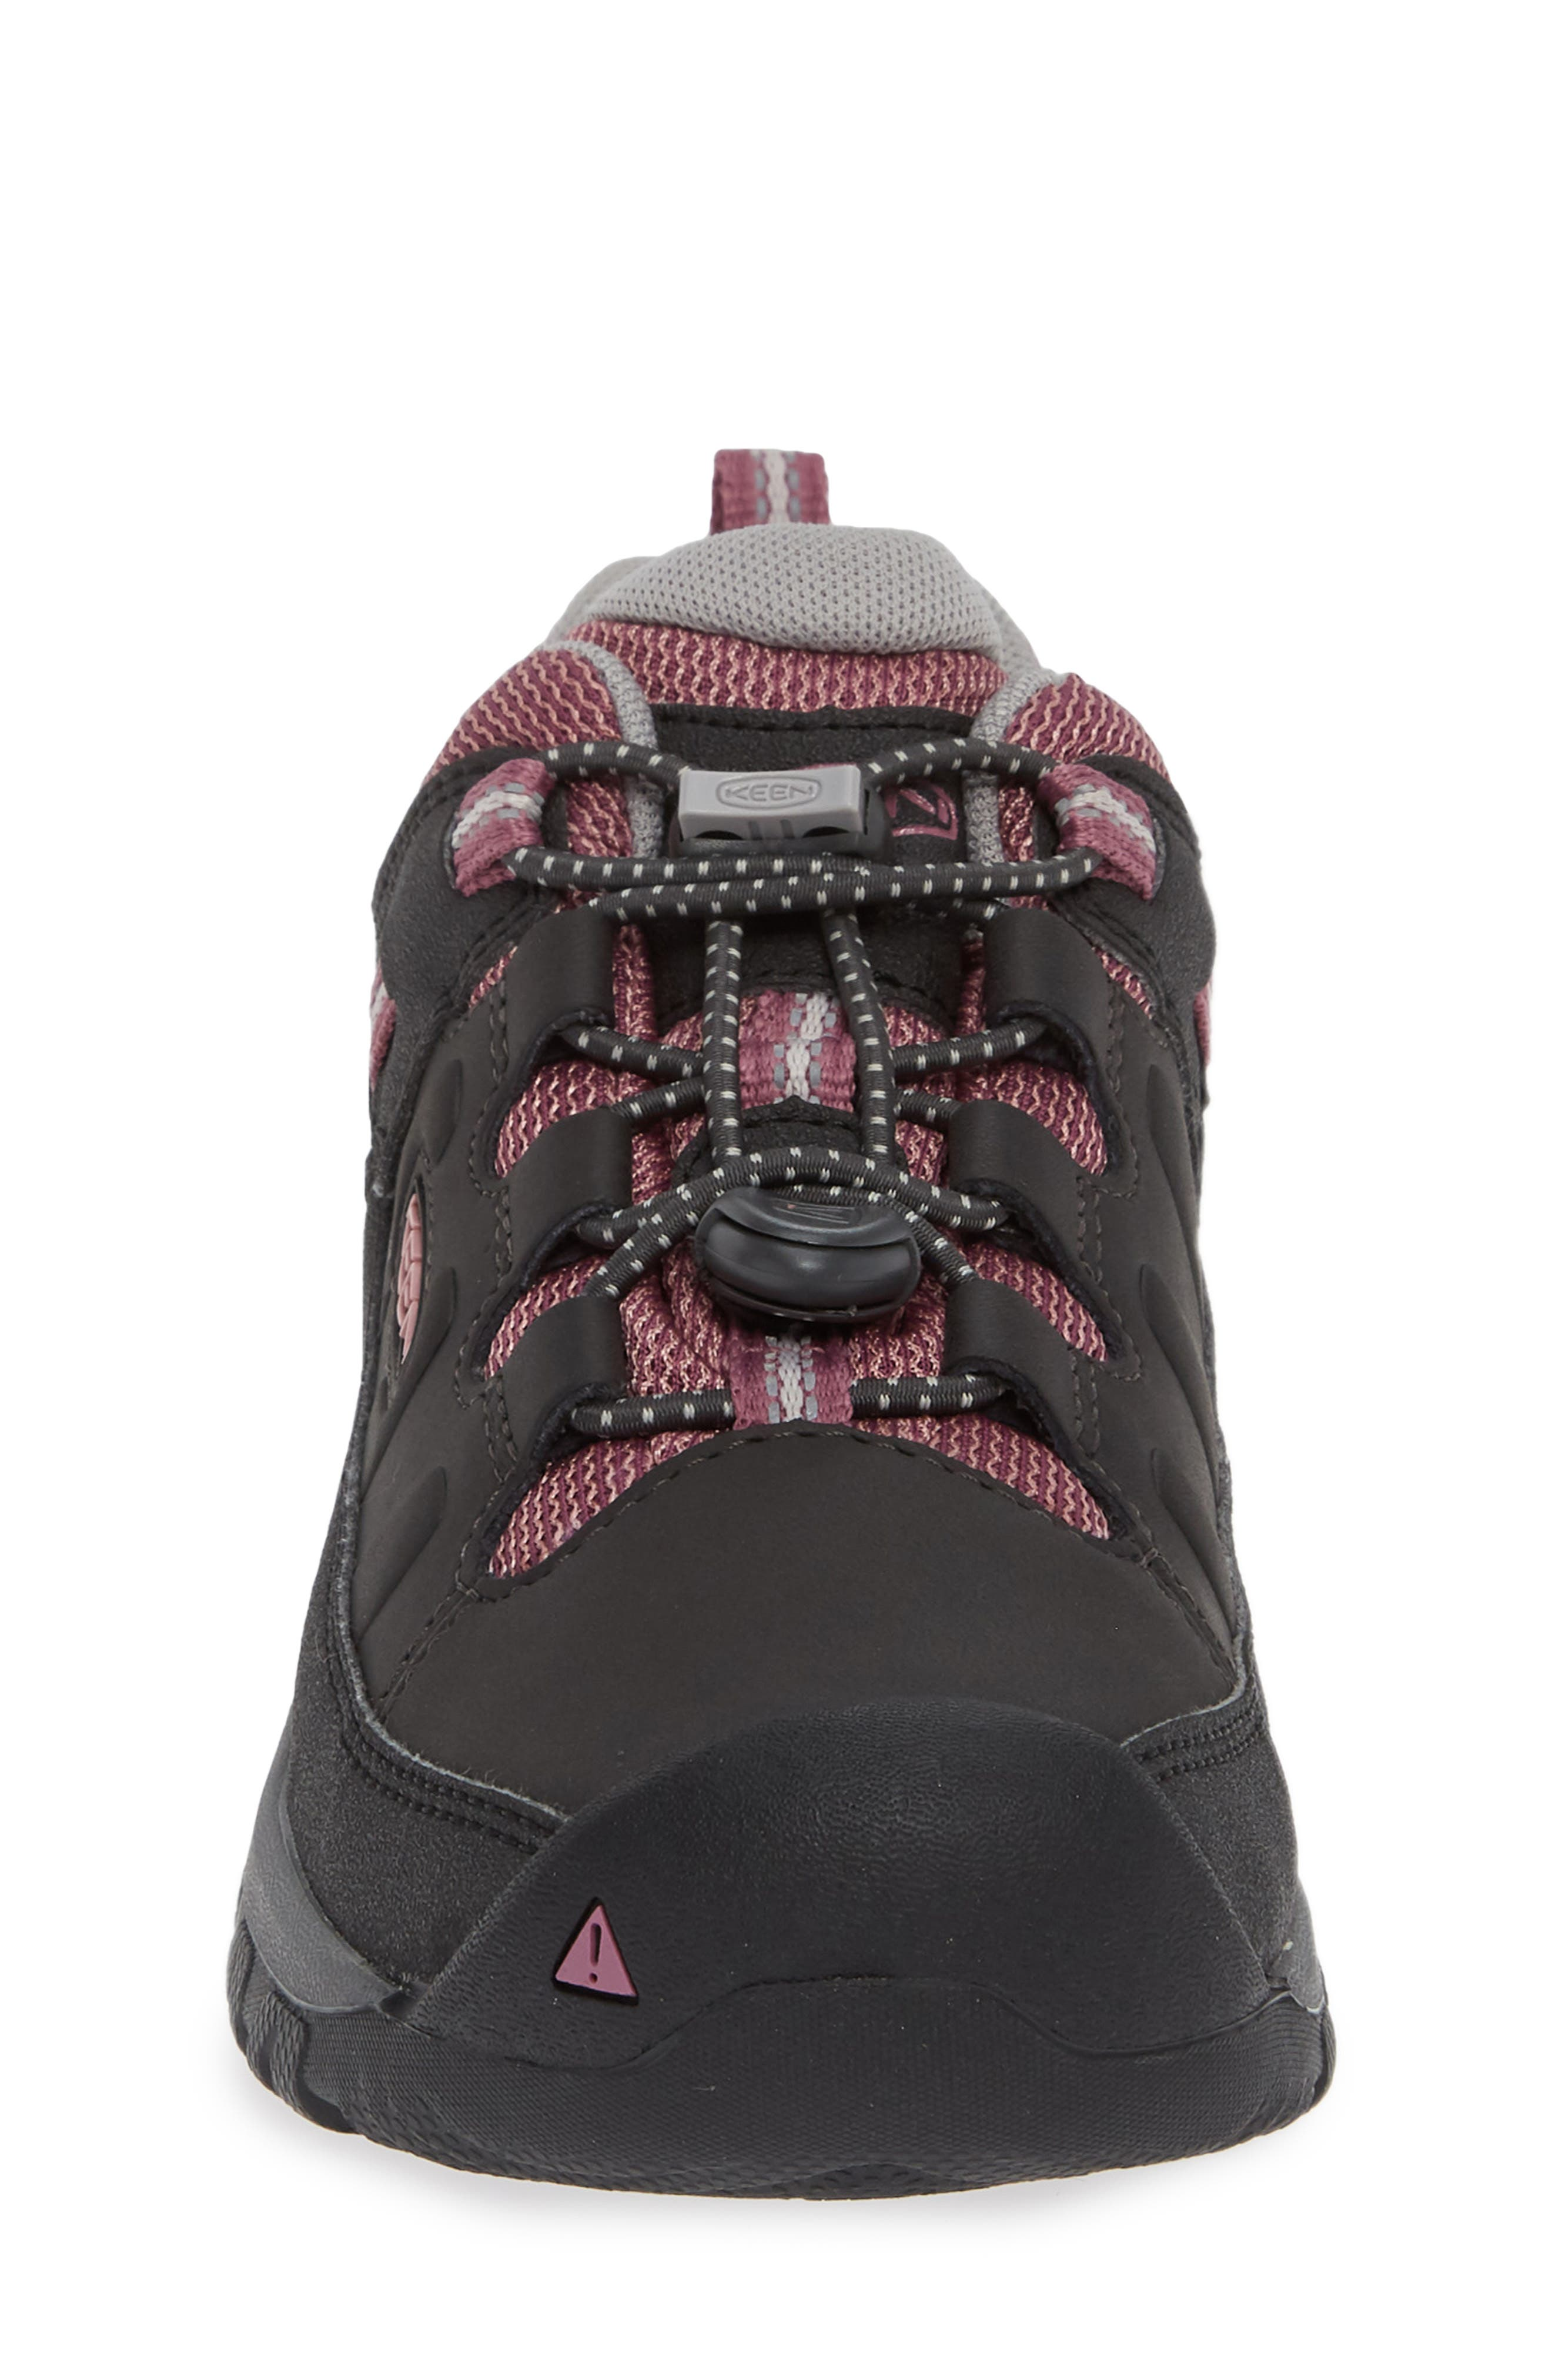 KEEN, Targhee Low Waterproof Boots, Alternate thumbnail 4, color, RAVEN/ TULIPWOOD/ TULIPWOOD